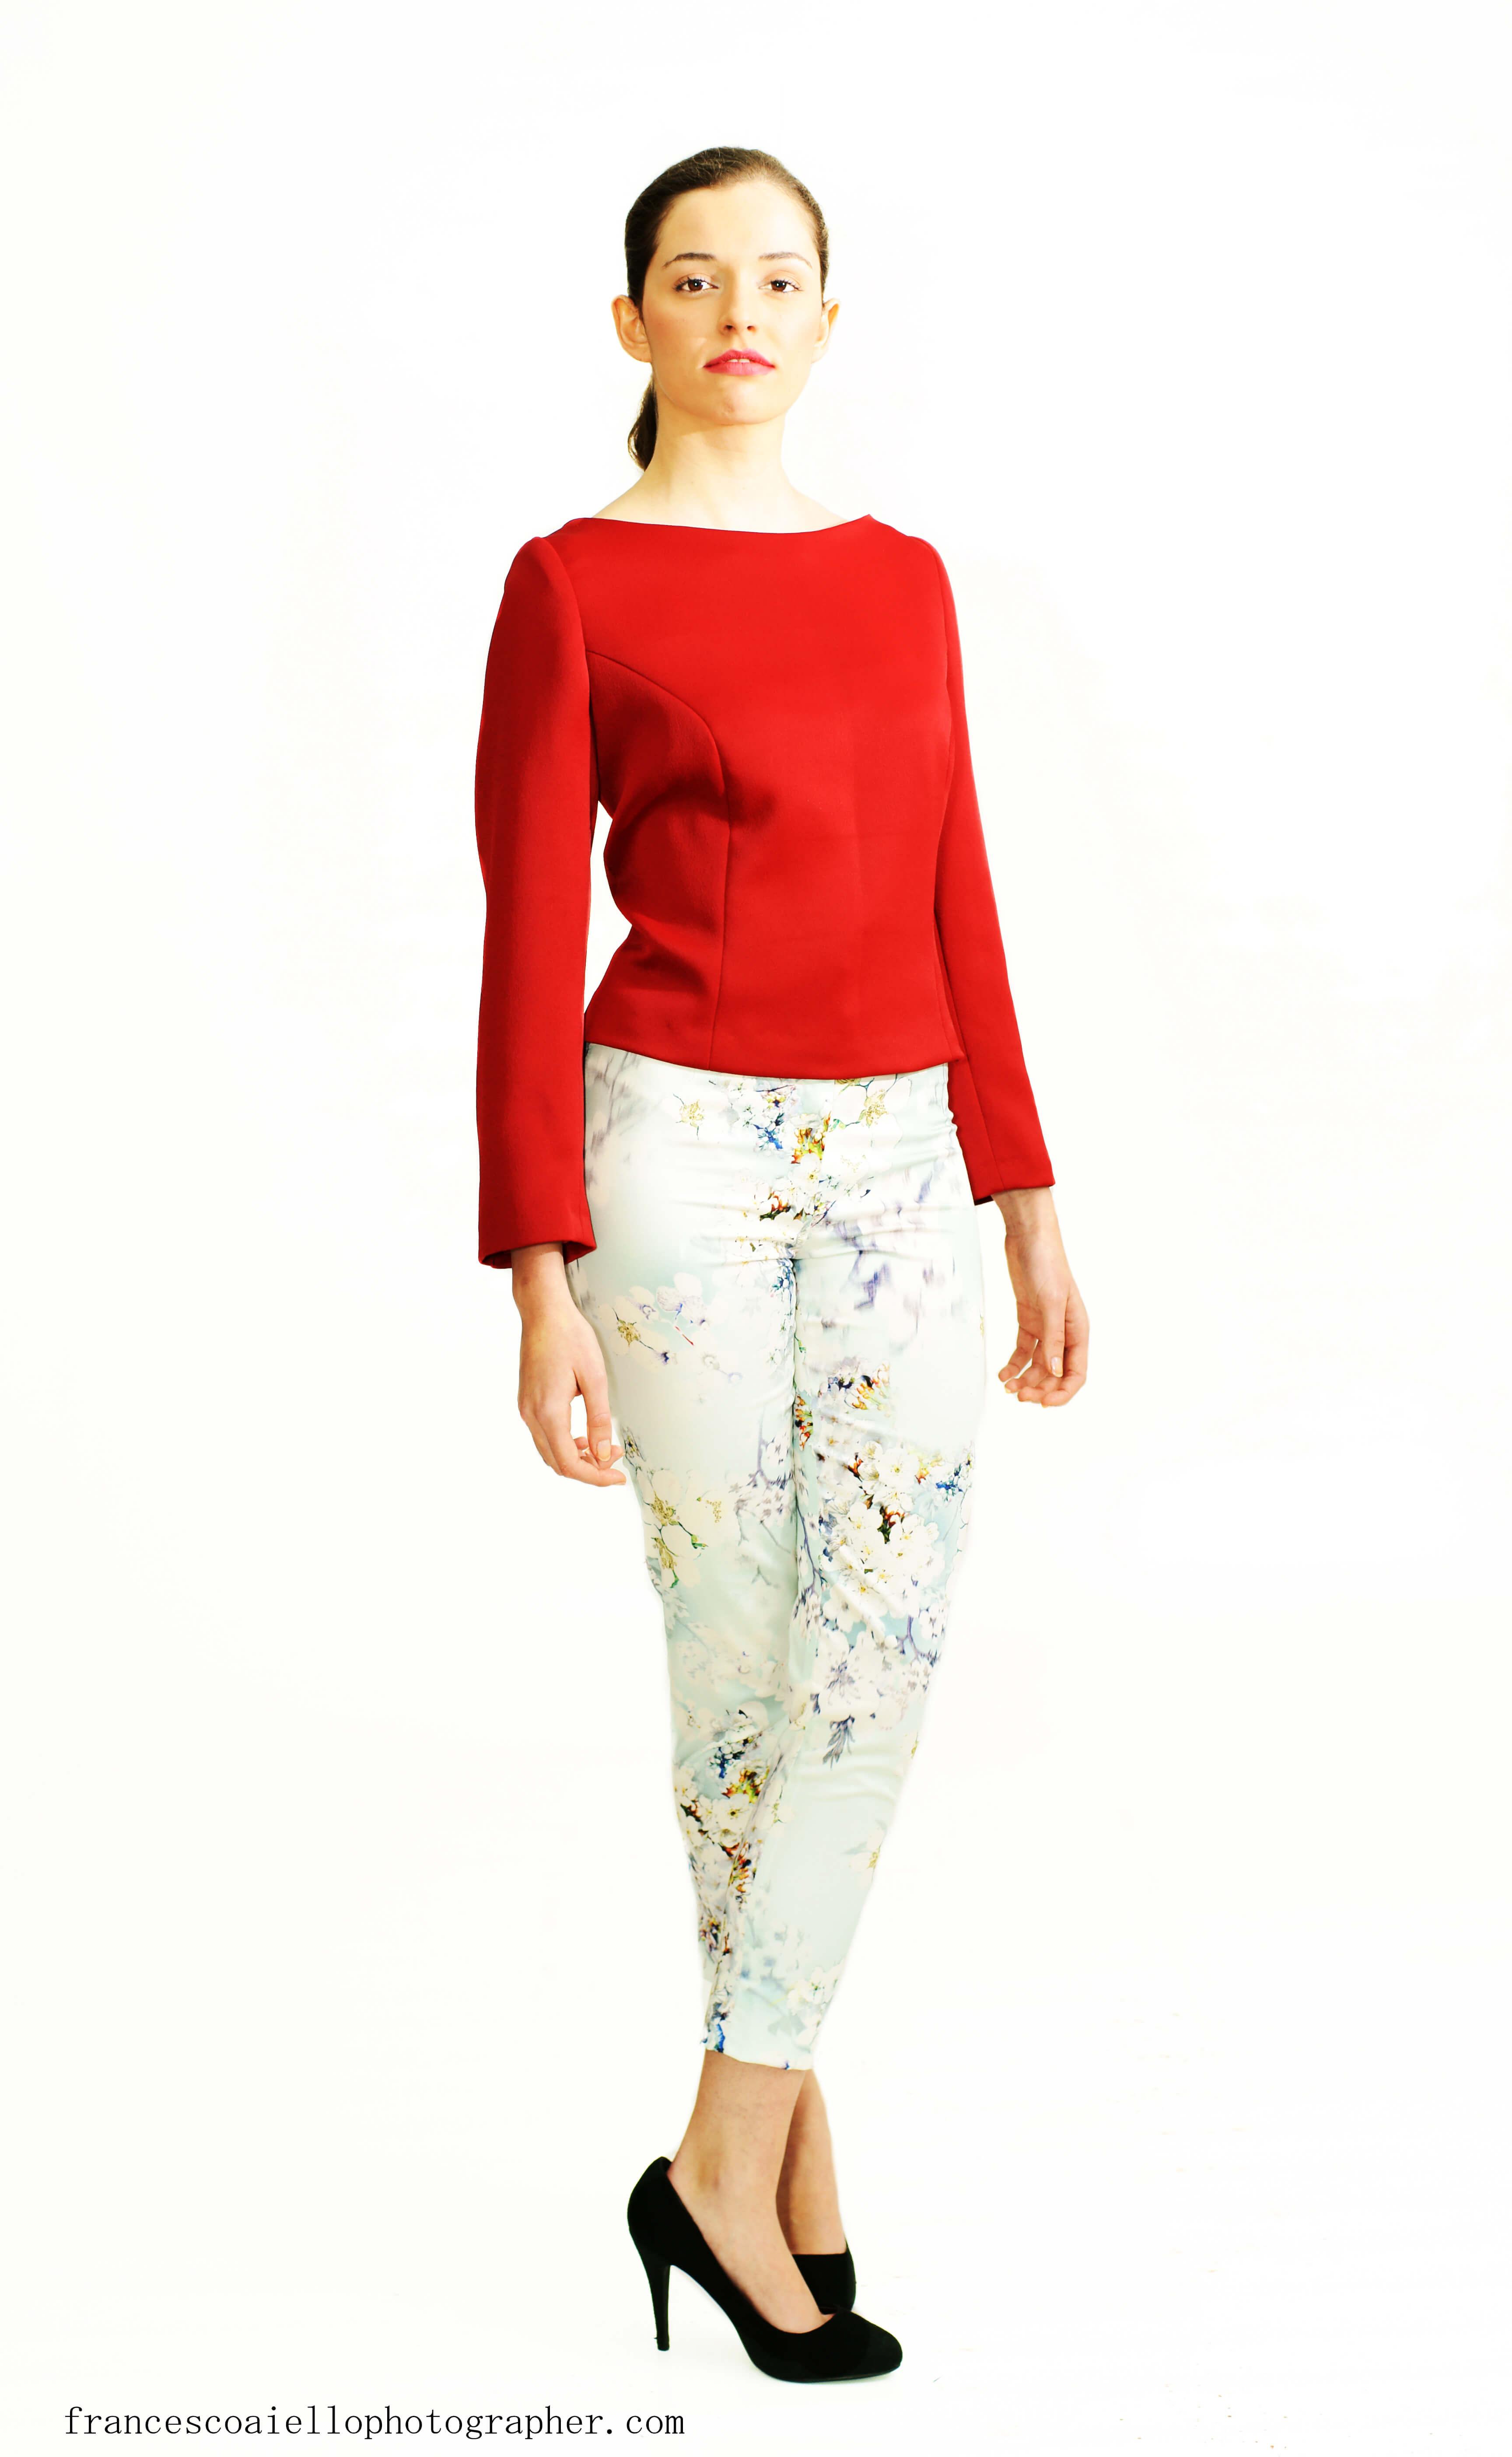 Pantalón pitillo estampado floral.